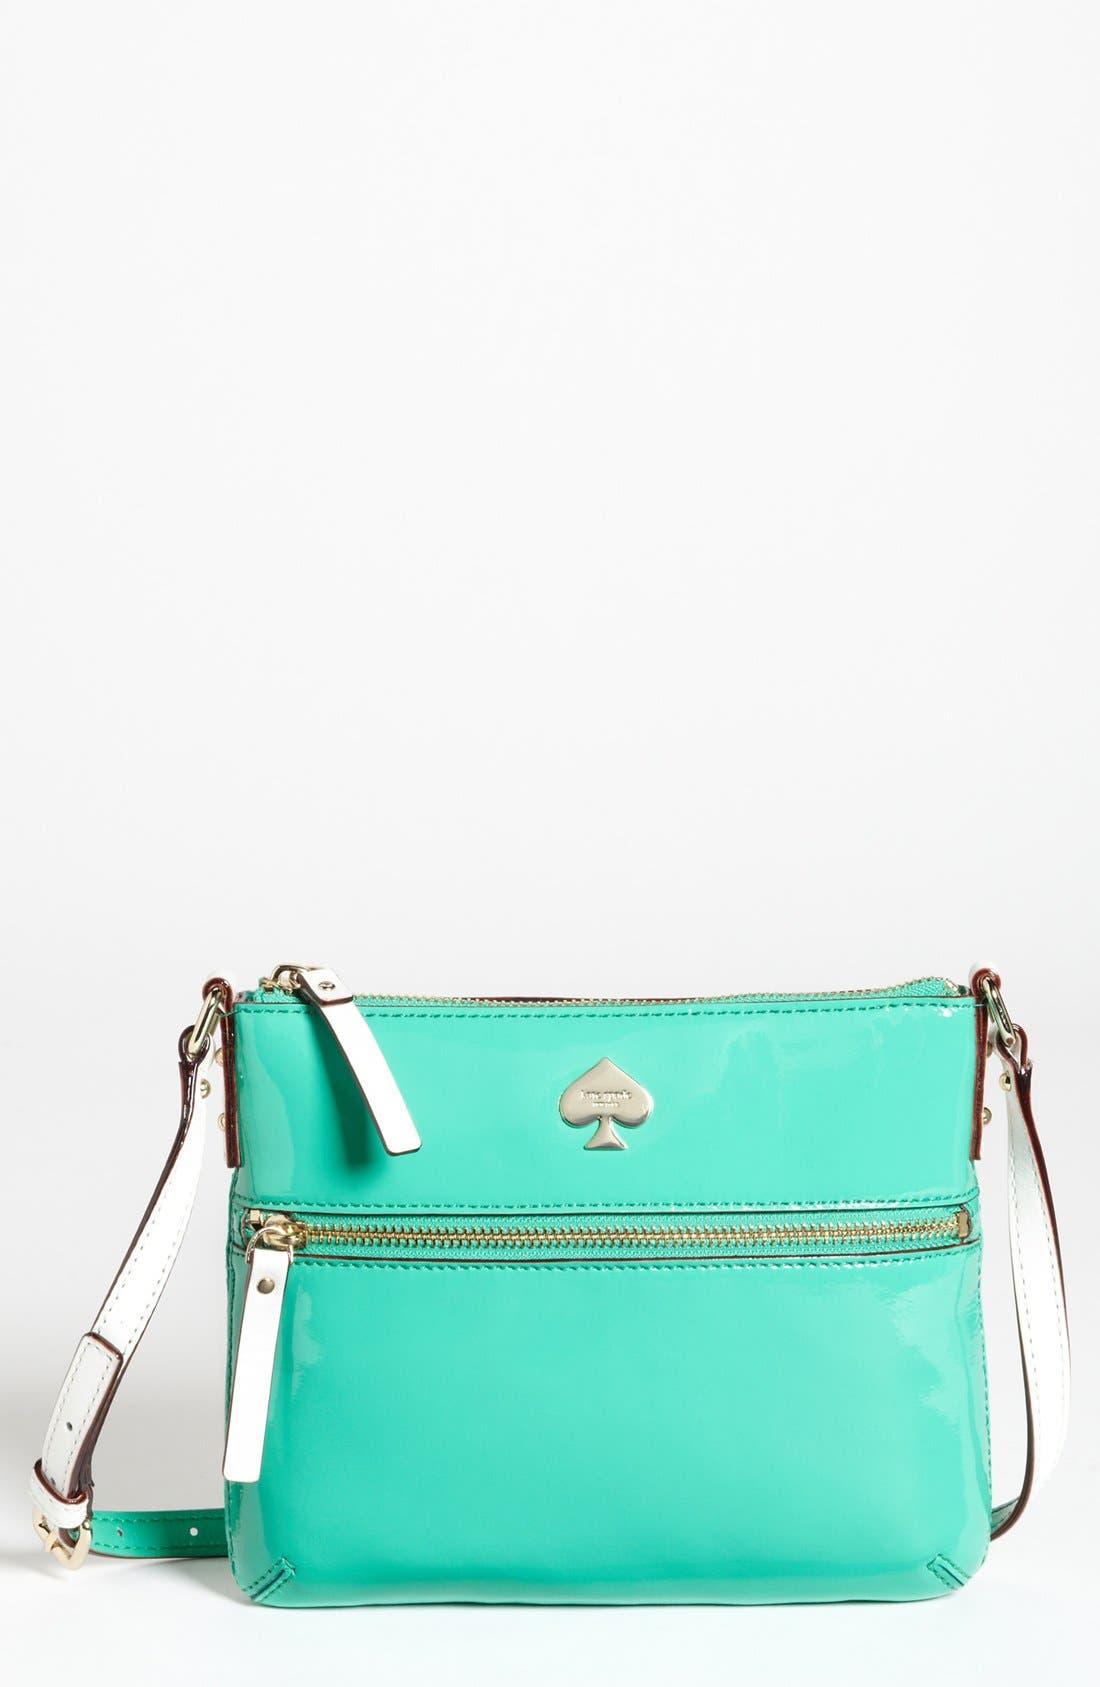 Main Image - kate spade new york 'flicker - tenley' patent crossbody bag